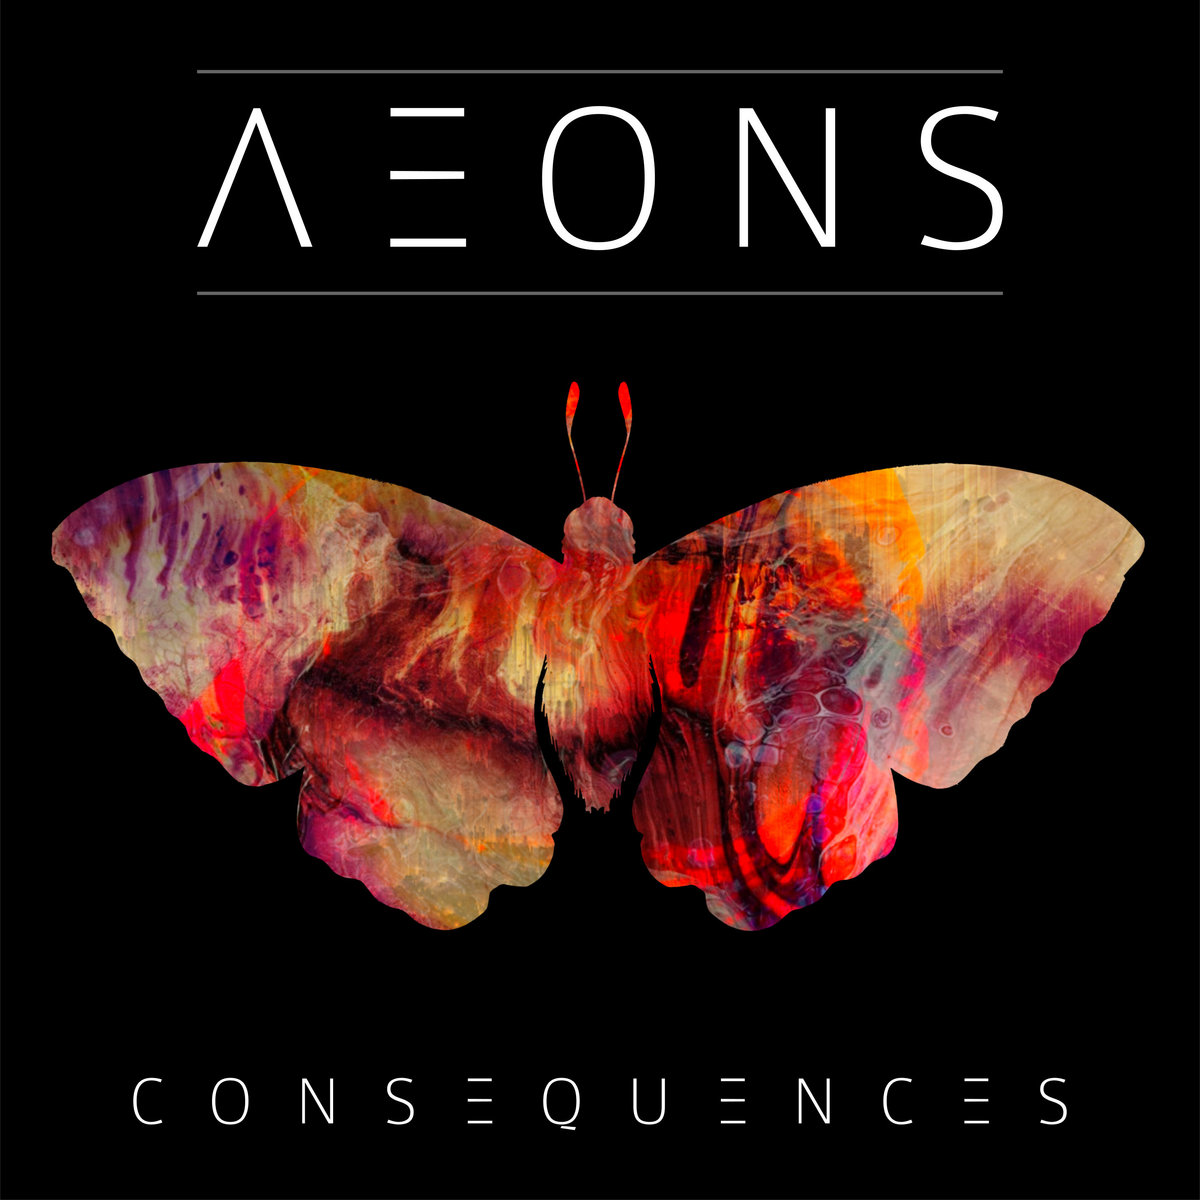 Consequences   AEONS   Aeons